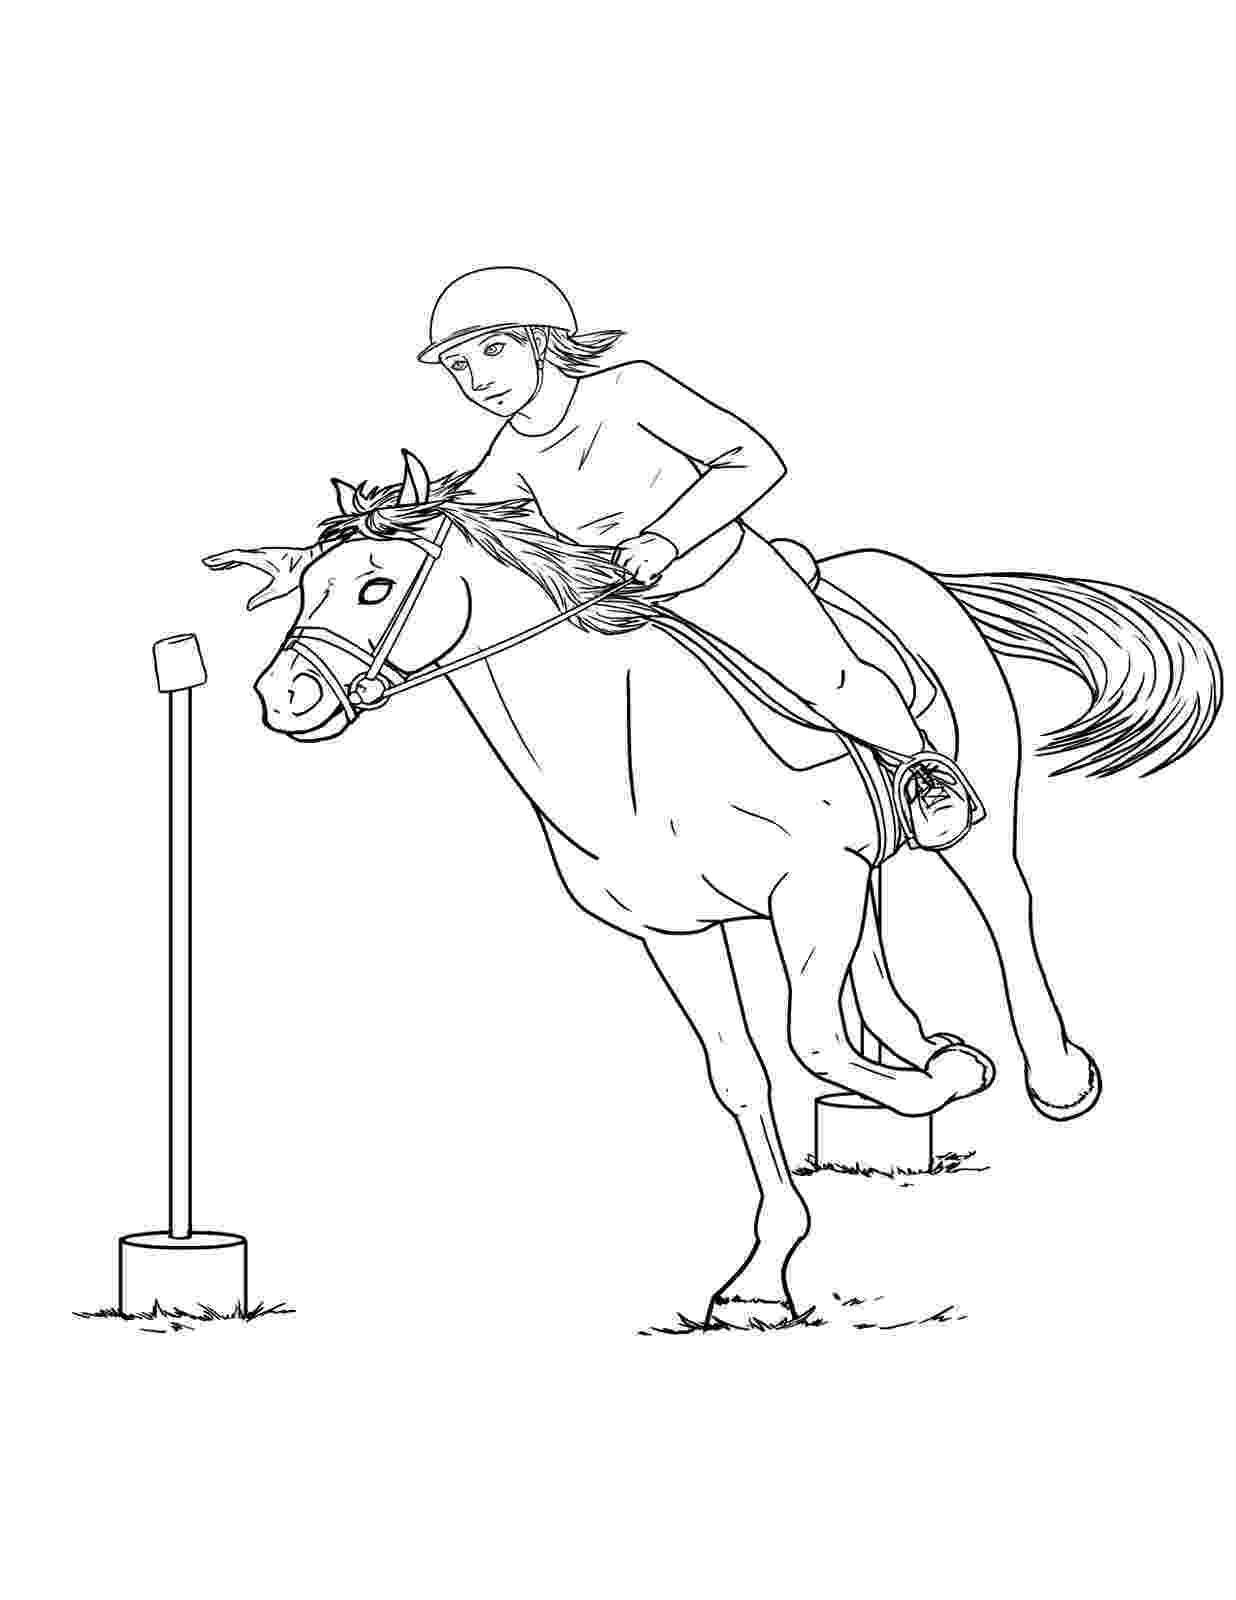 coloring games laura ambrosiano pony club coloring book coloring games